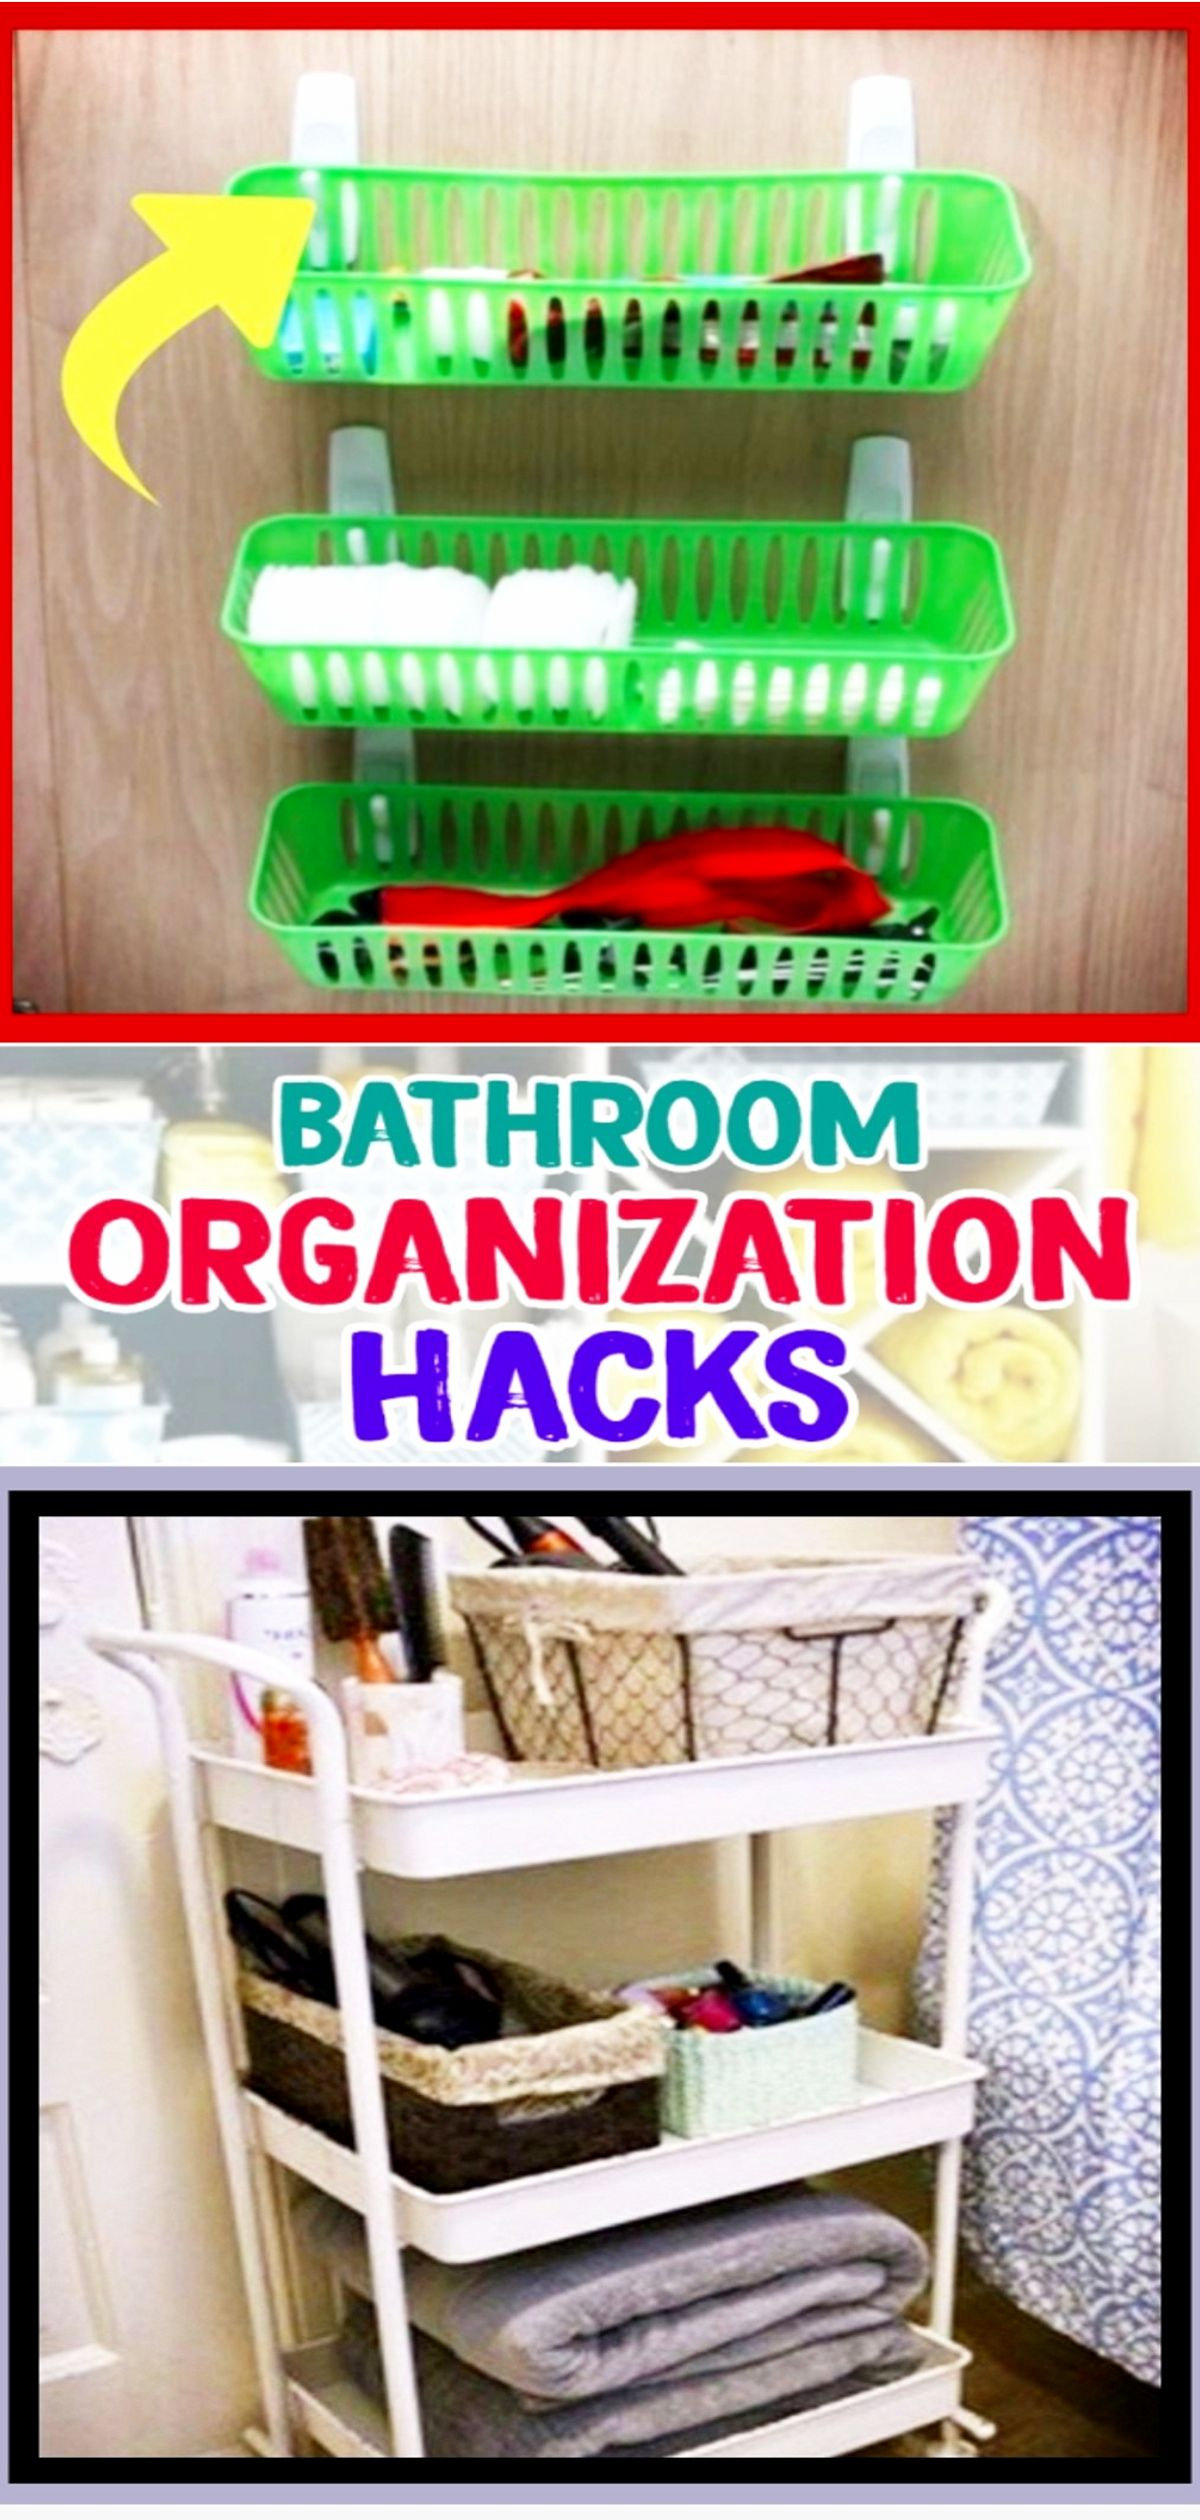 bathroom organization hacks 7 clever ways to organize your rh pinterest com